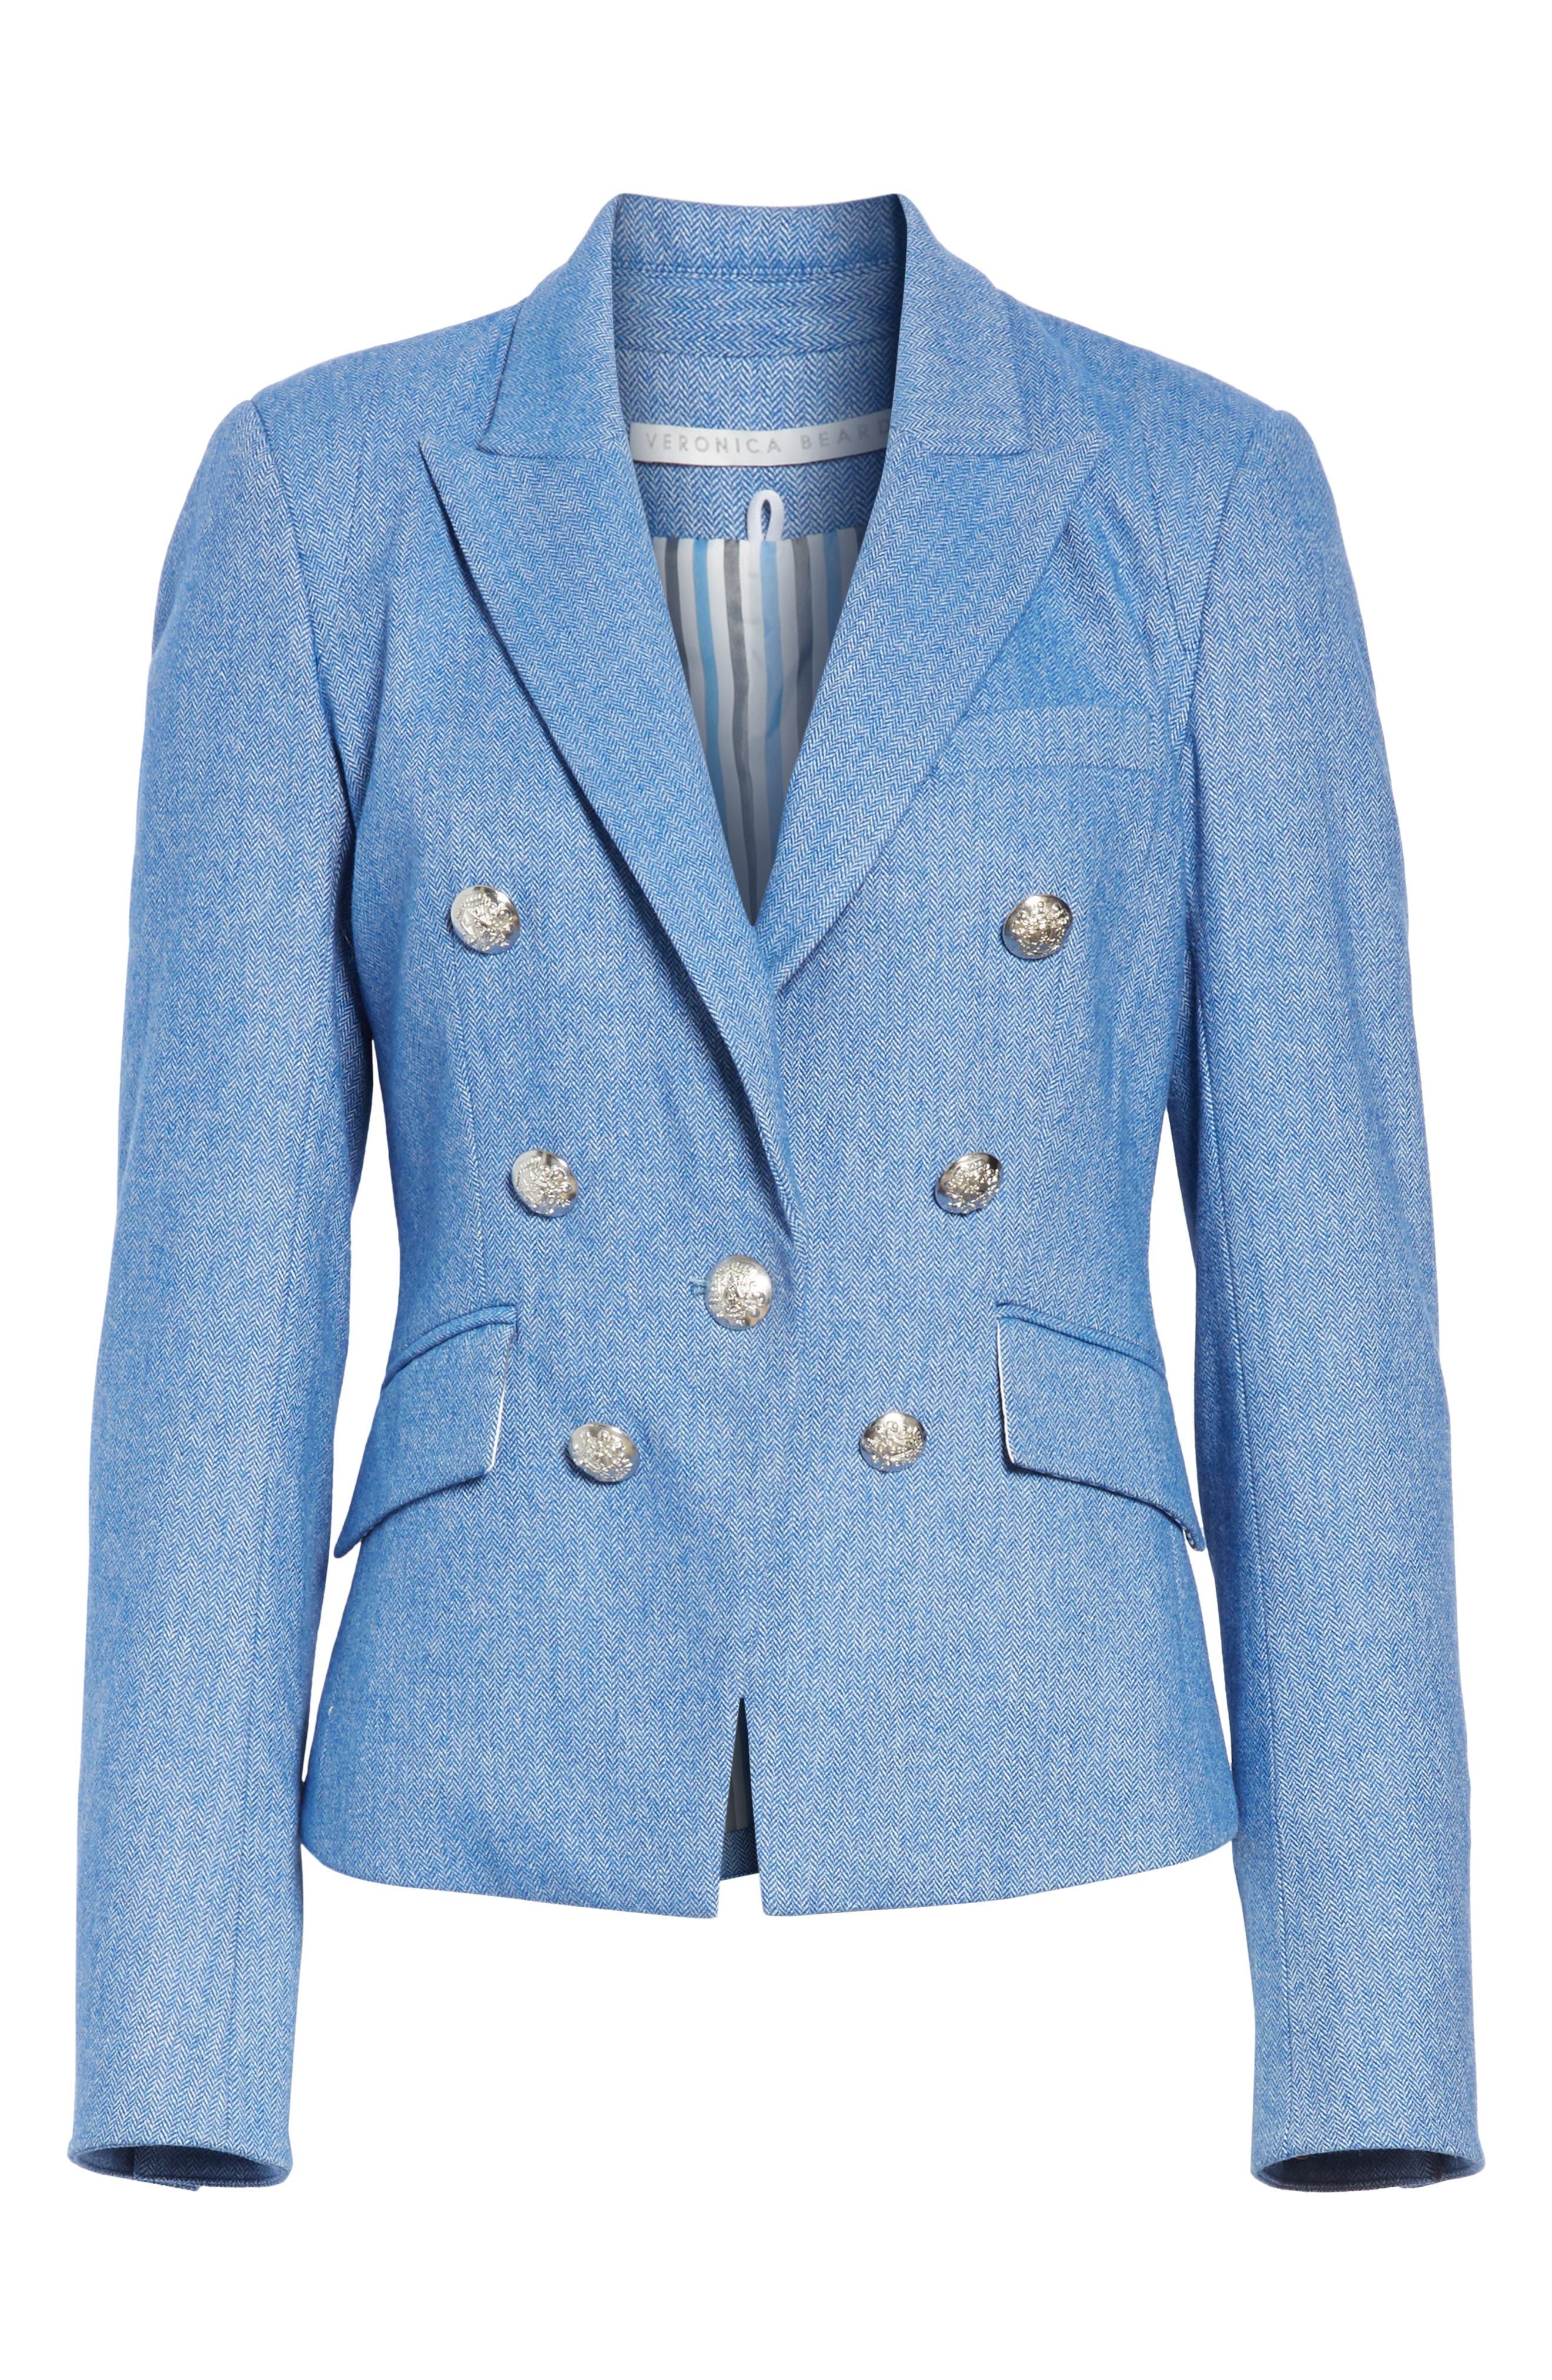 Diego Herringbone Dickey Jacket,                             Main thumbnail 1, color,                             BLUE